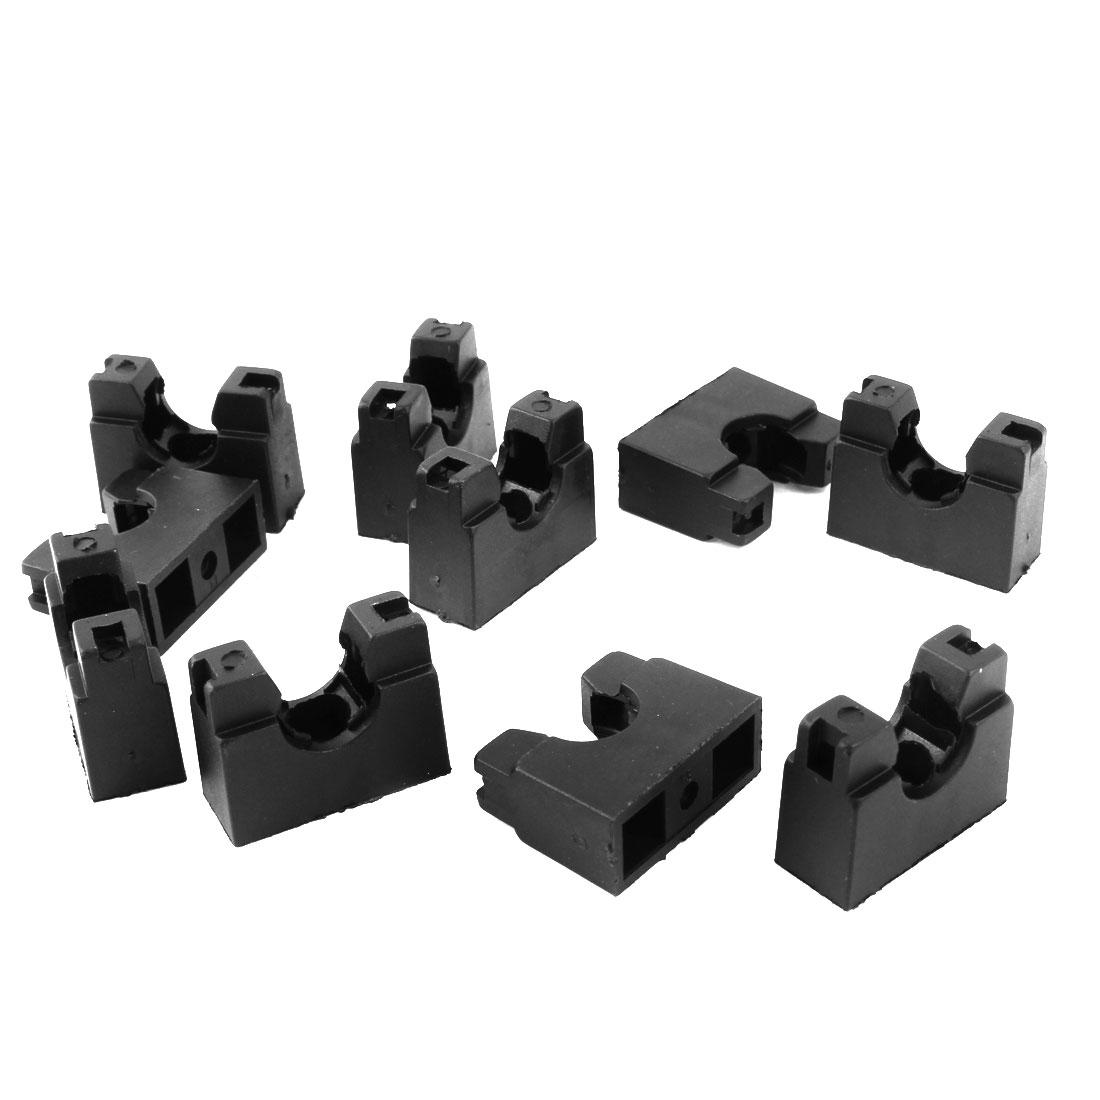 AD13 Flexible Pipe Conduit Plastic Mounting Stand Bracket 10pcs